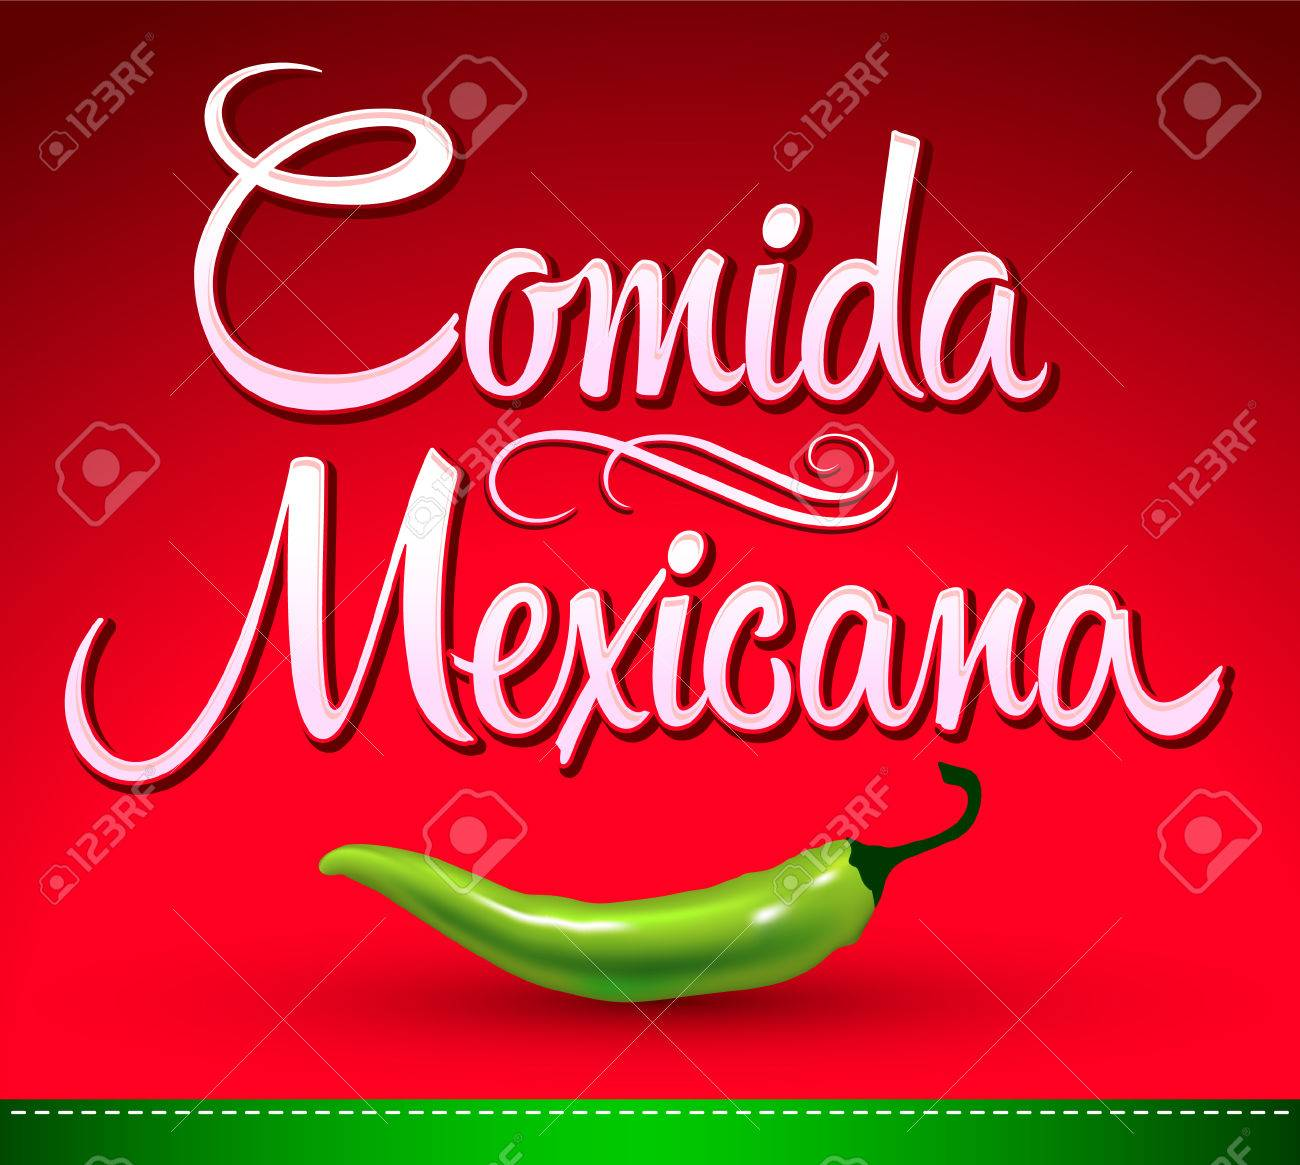 Comida Mexicana - Mexican Food Spanish Text - Jalapeno Pepper ...